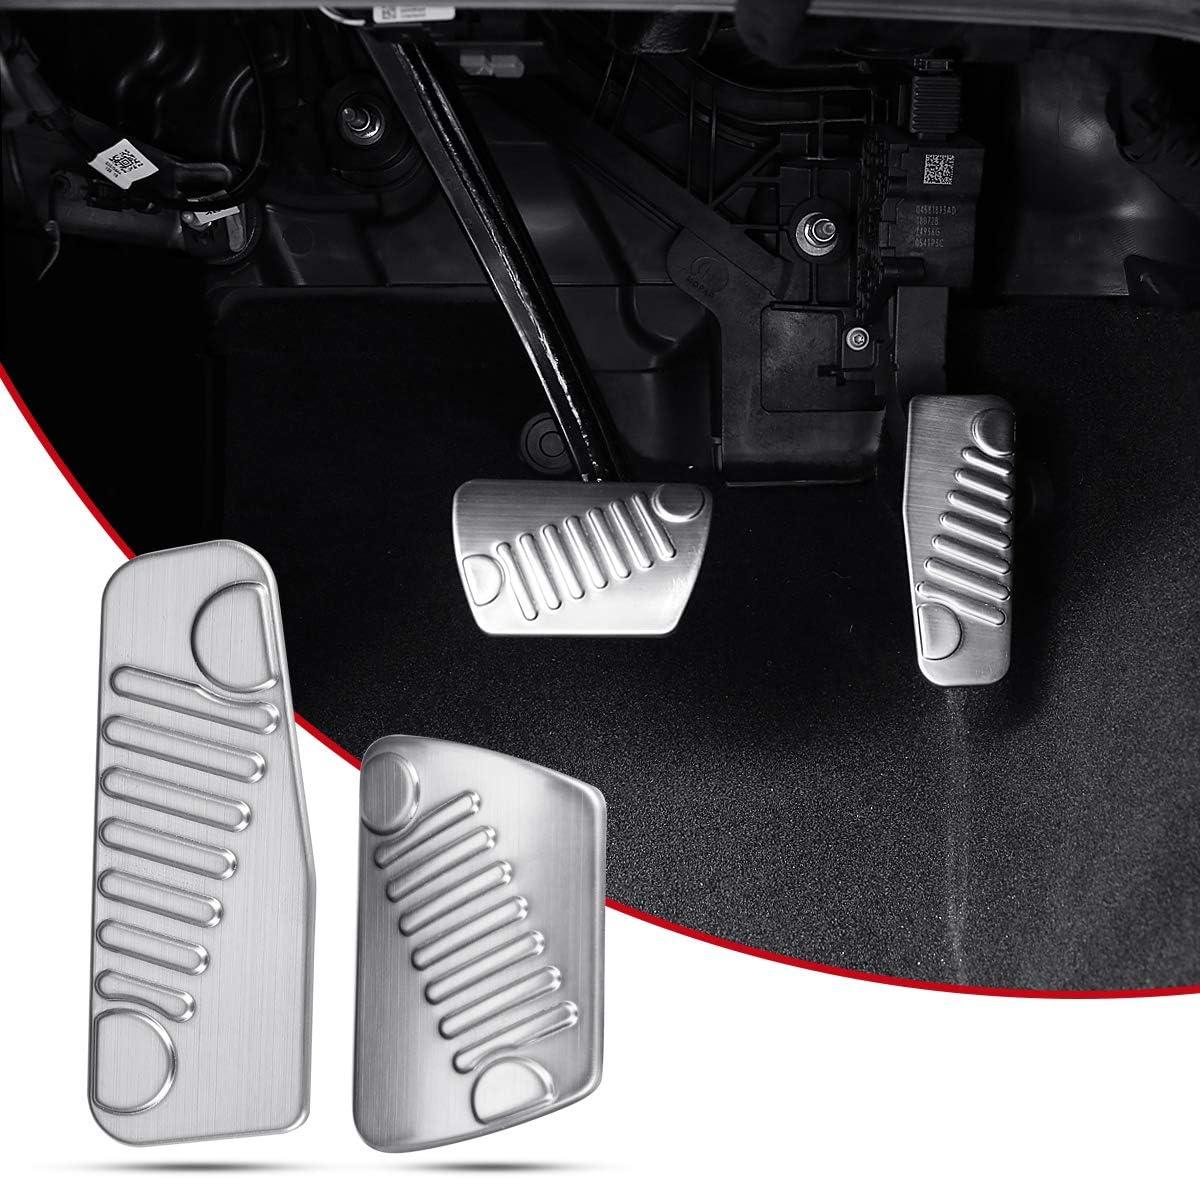 ZGBADMAN Stainless Steel Foot Pedal Set kit Auto Foot Pedal Pads Pedal Accelerator Brake Pad Trim Cover for Jeep Wrangler JL 2018 2pcs//Set Black